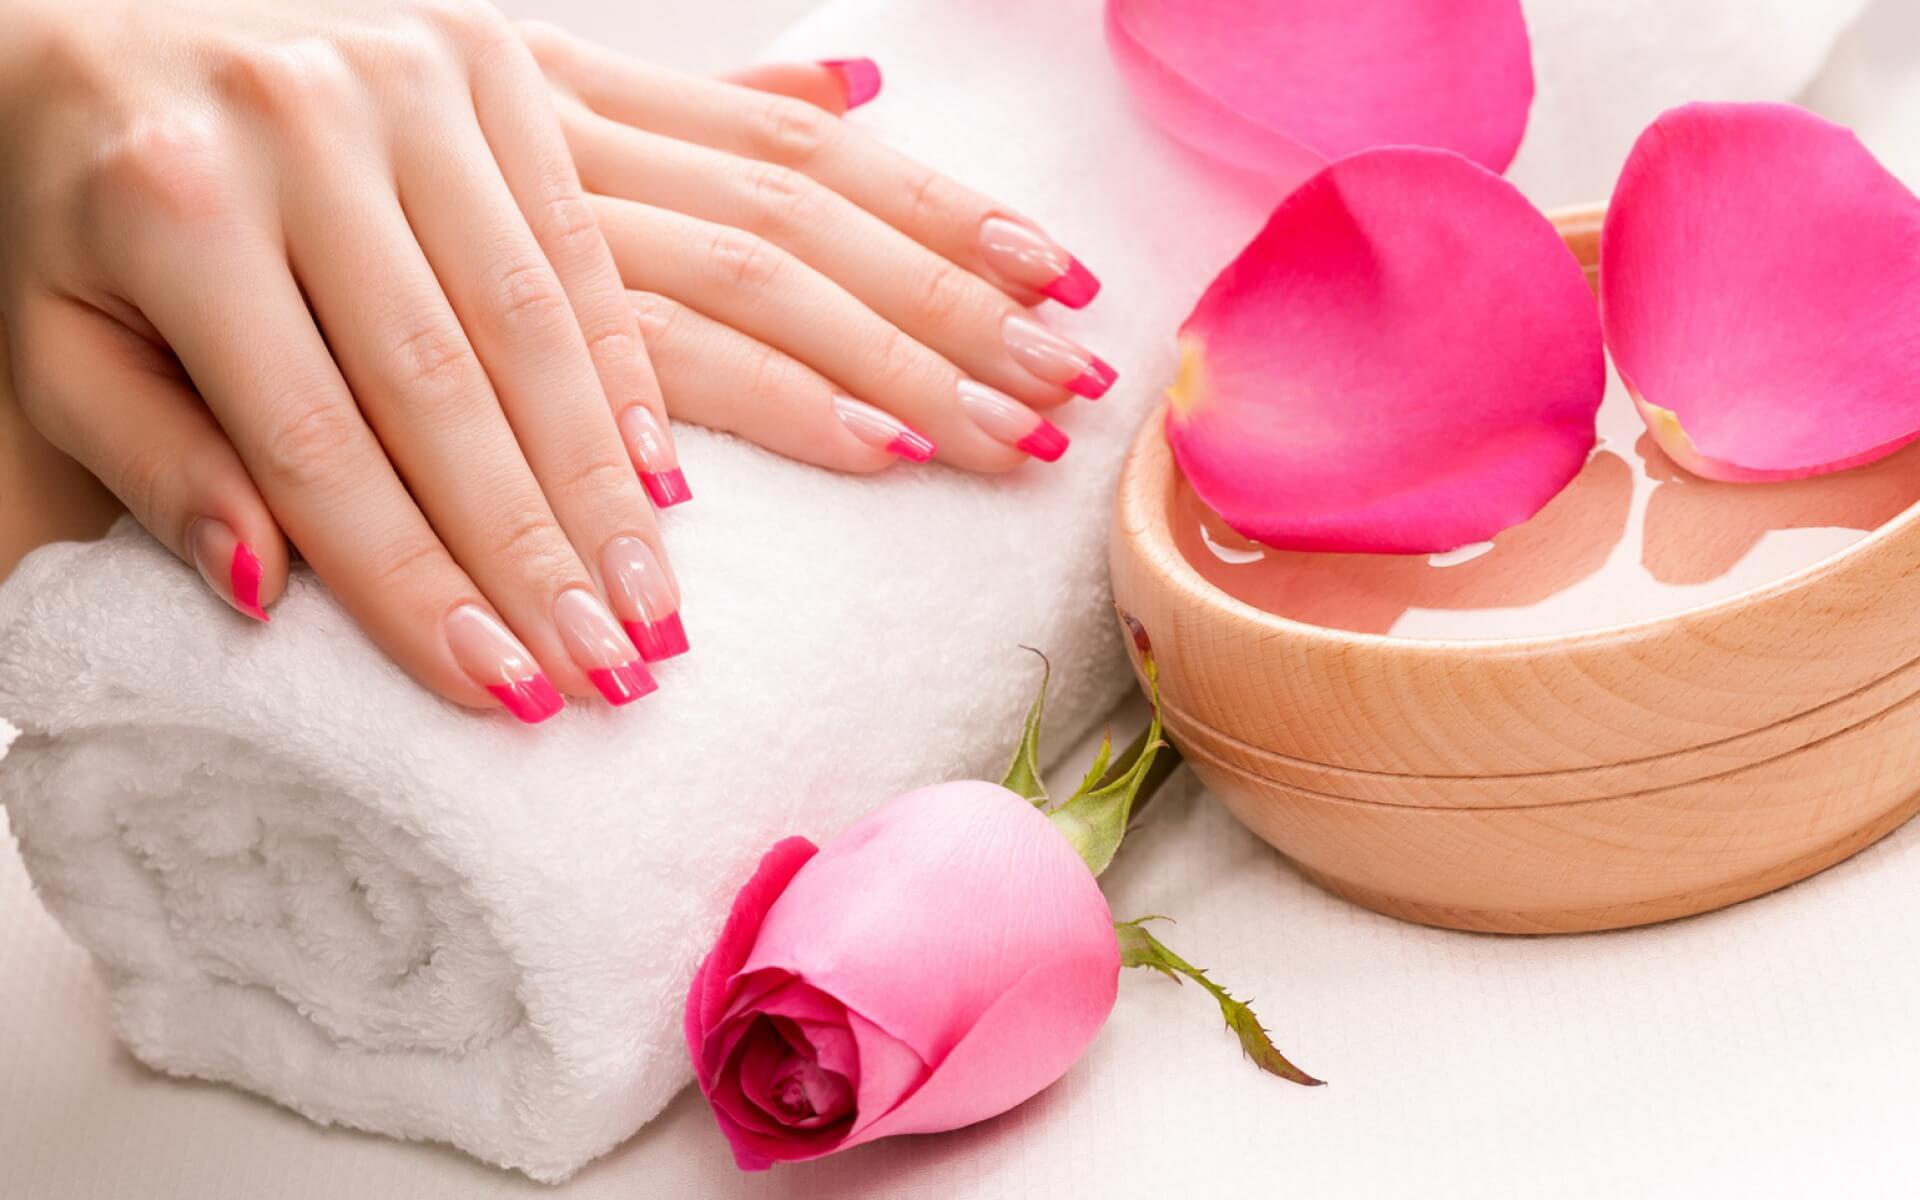 Enhanced nails -